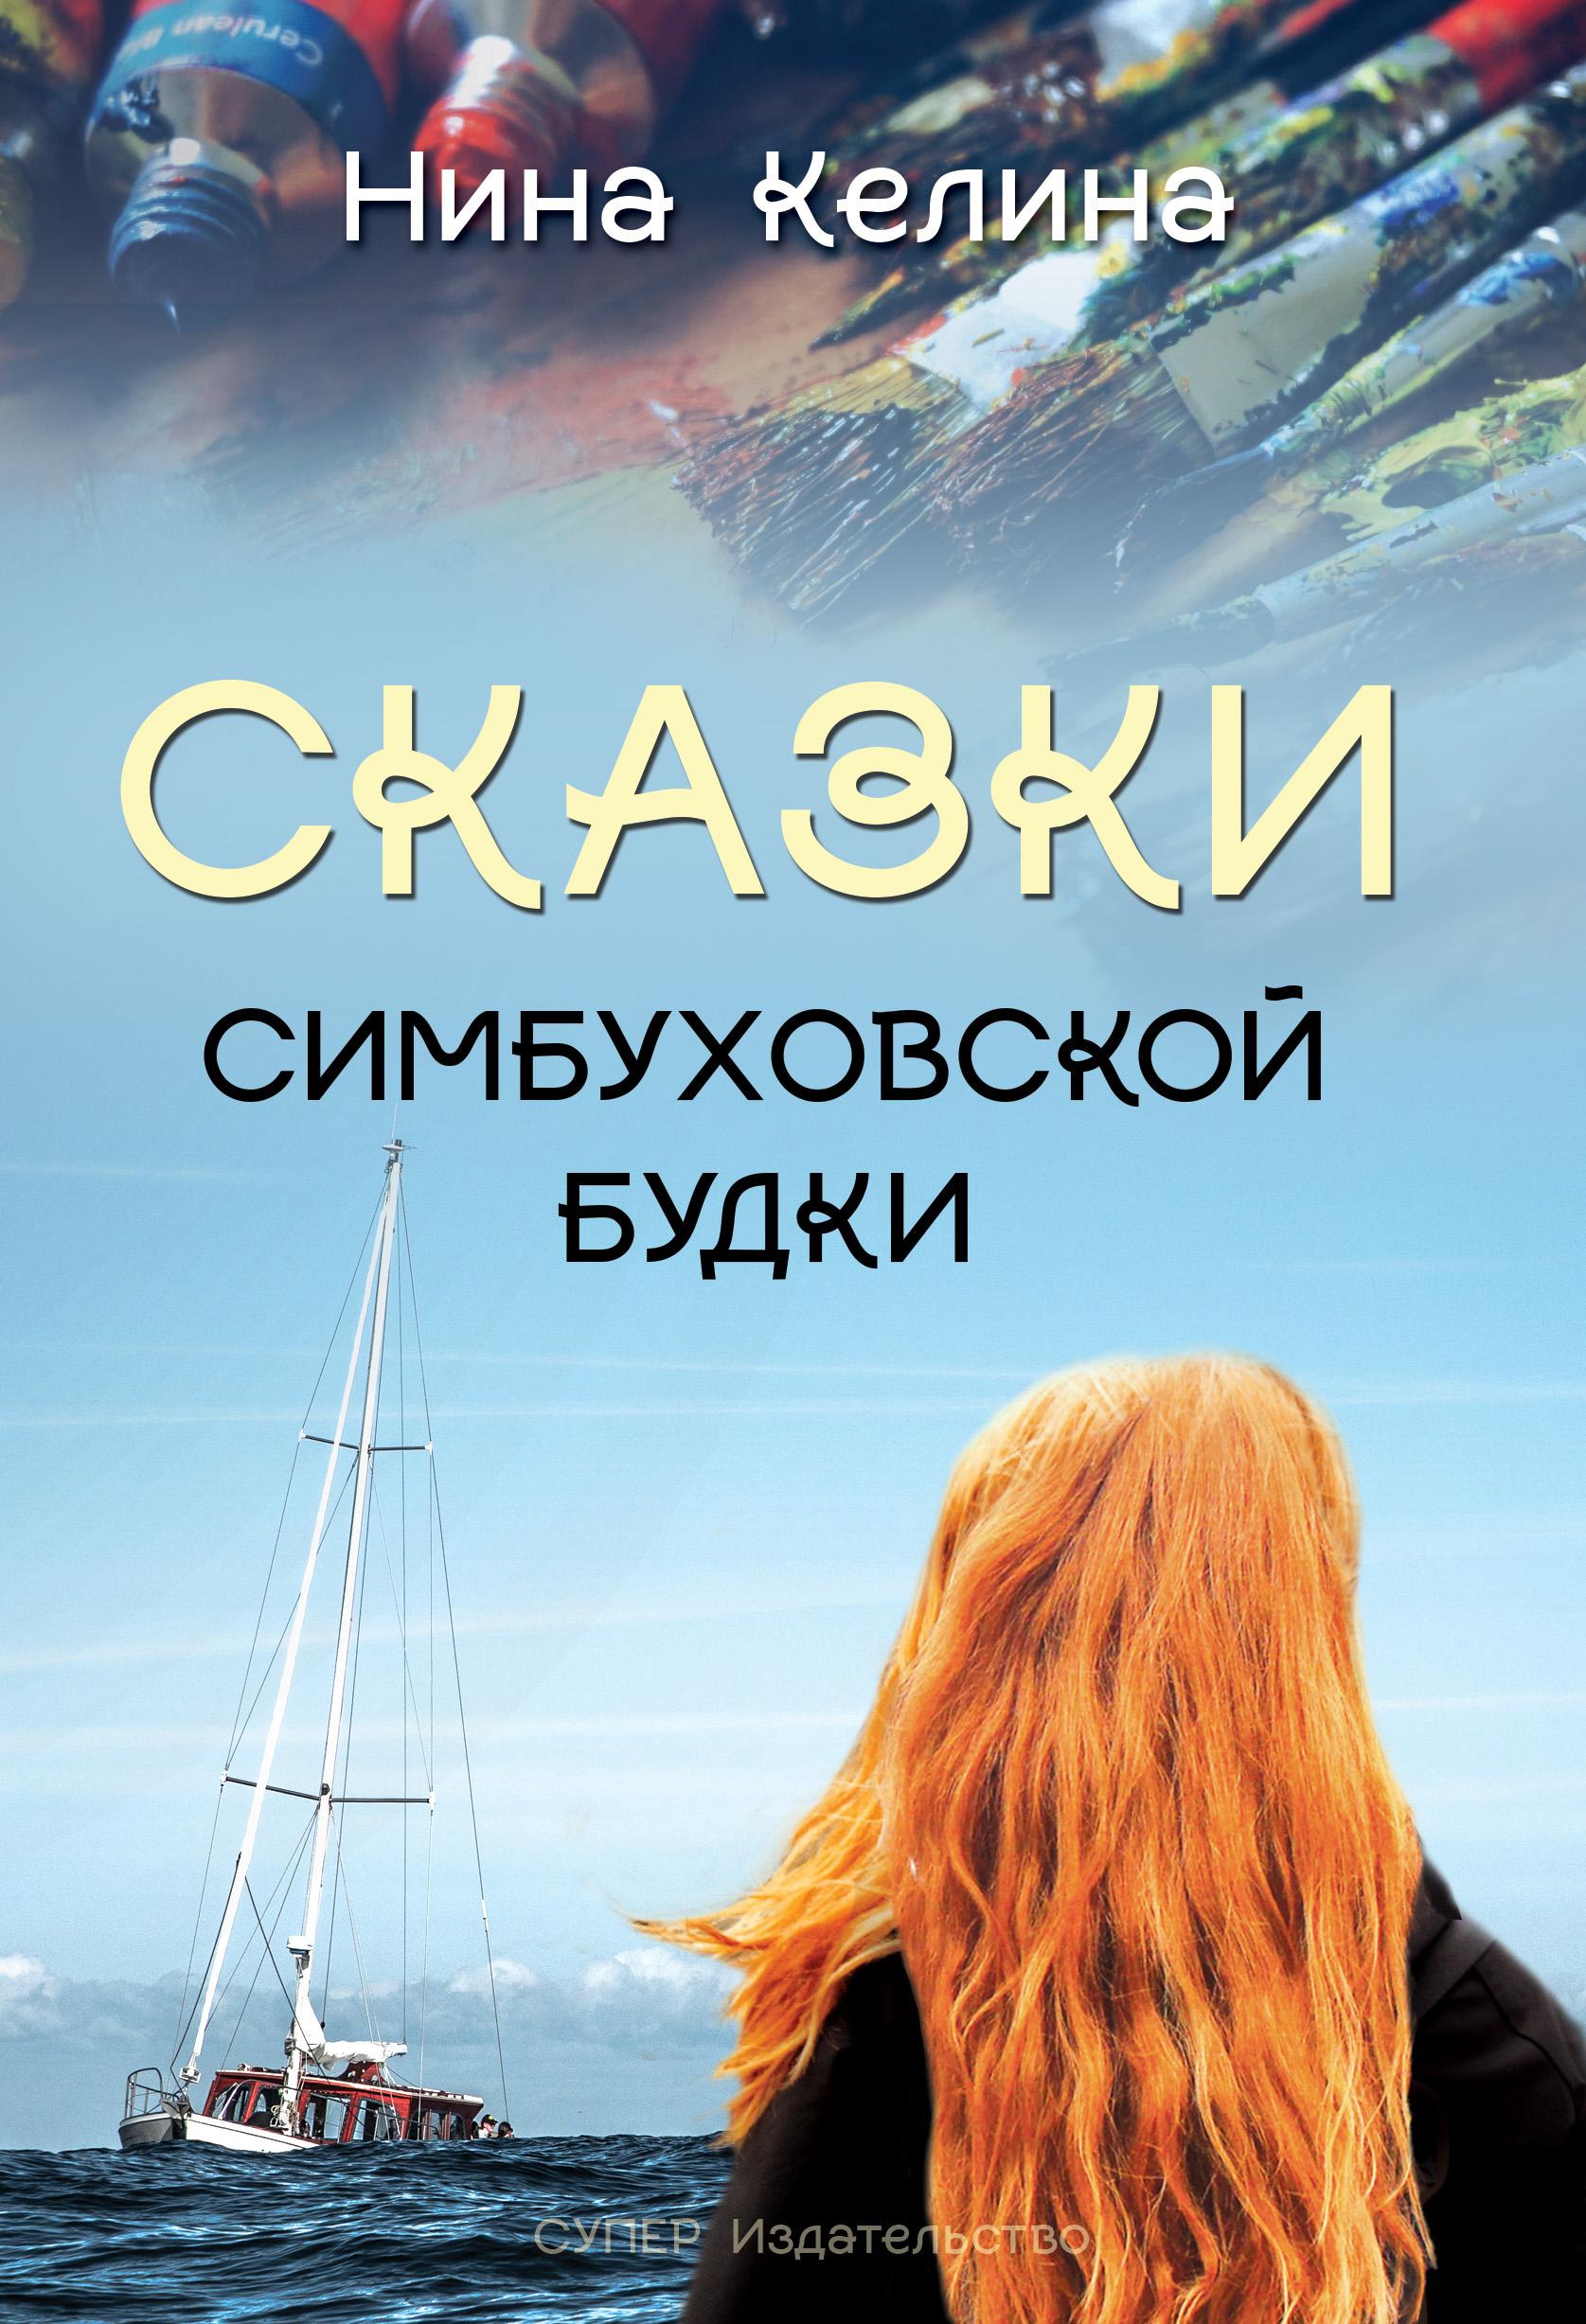 Нина Келина Сказки Симбуховской будки